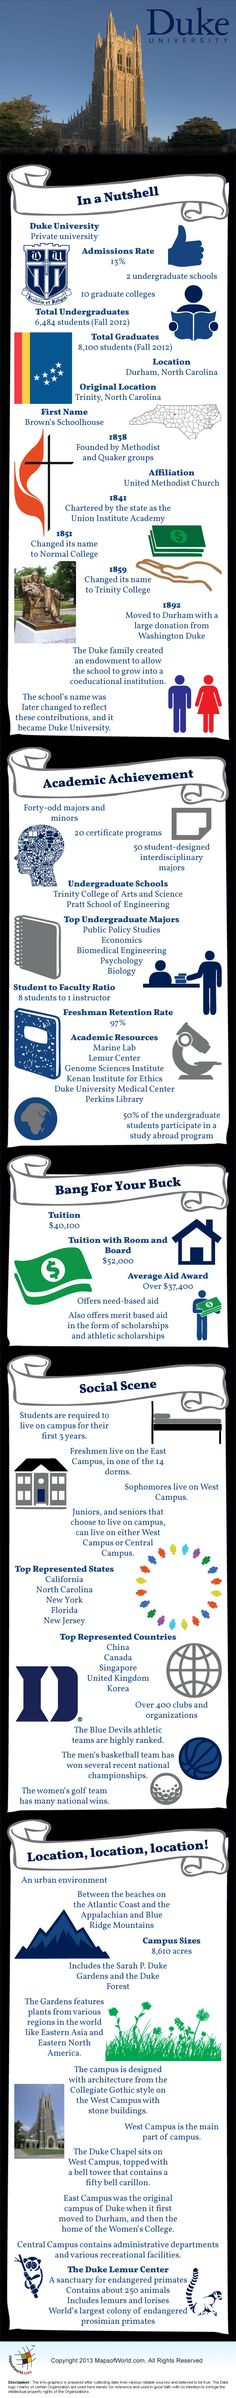 Duke University Infographic